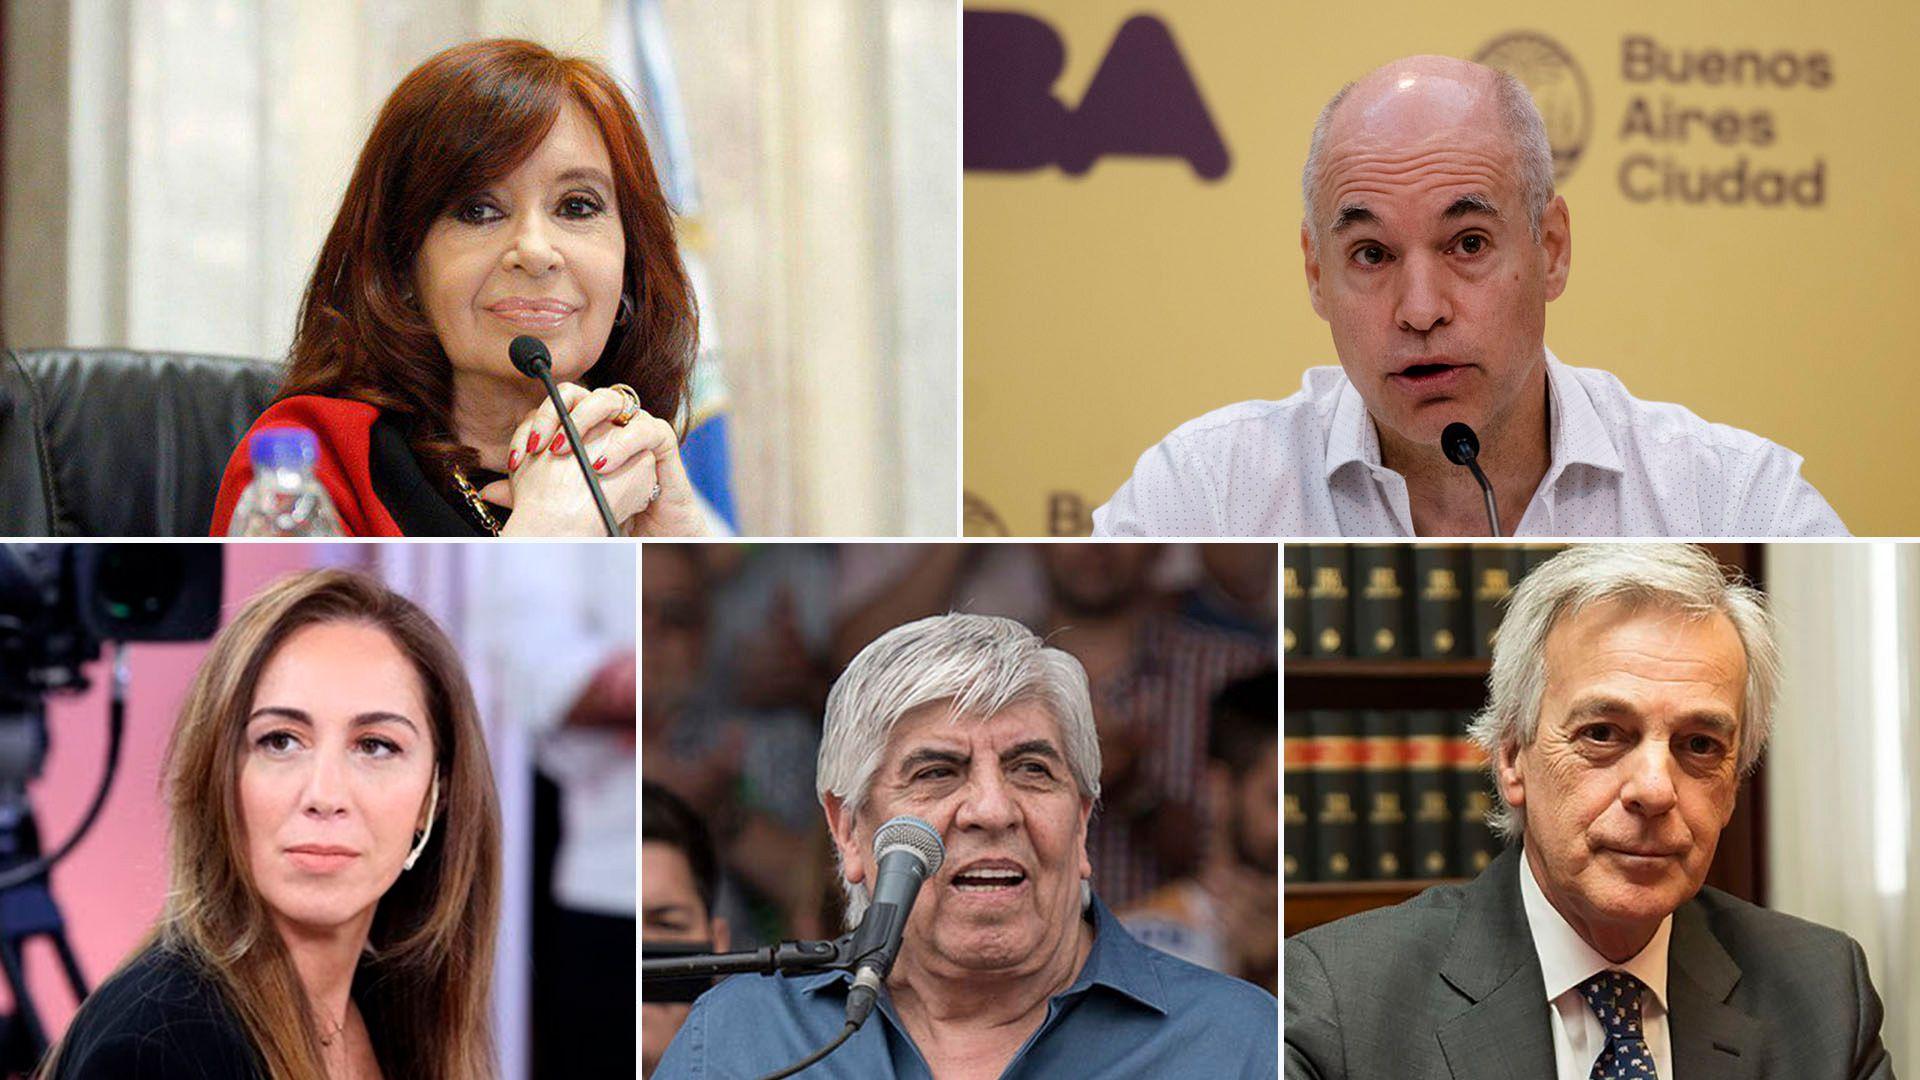 Partida - Cristina Kirchner, Rodríguez Larreta, María Eugenia Vidal, Hugo Moyano y Martín Irurzun